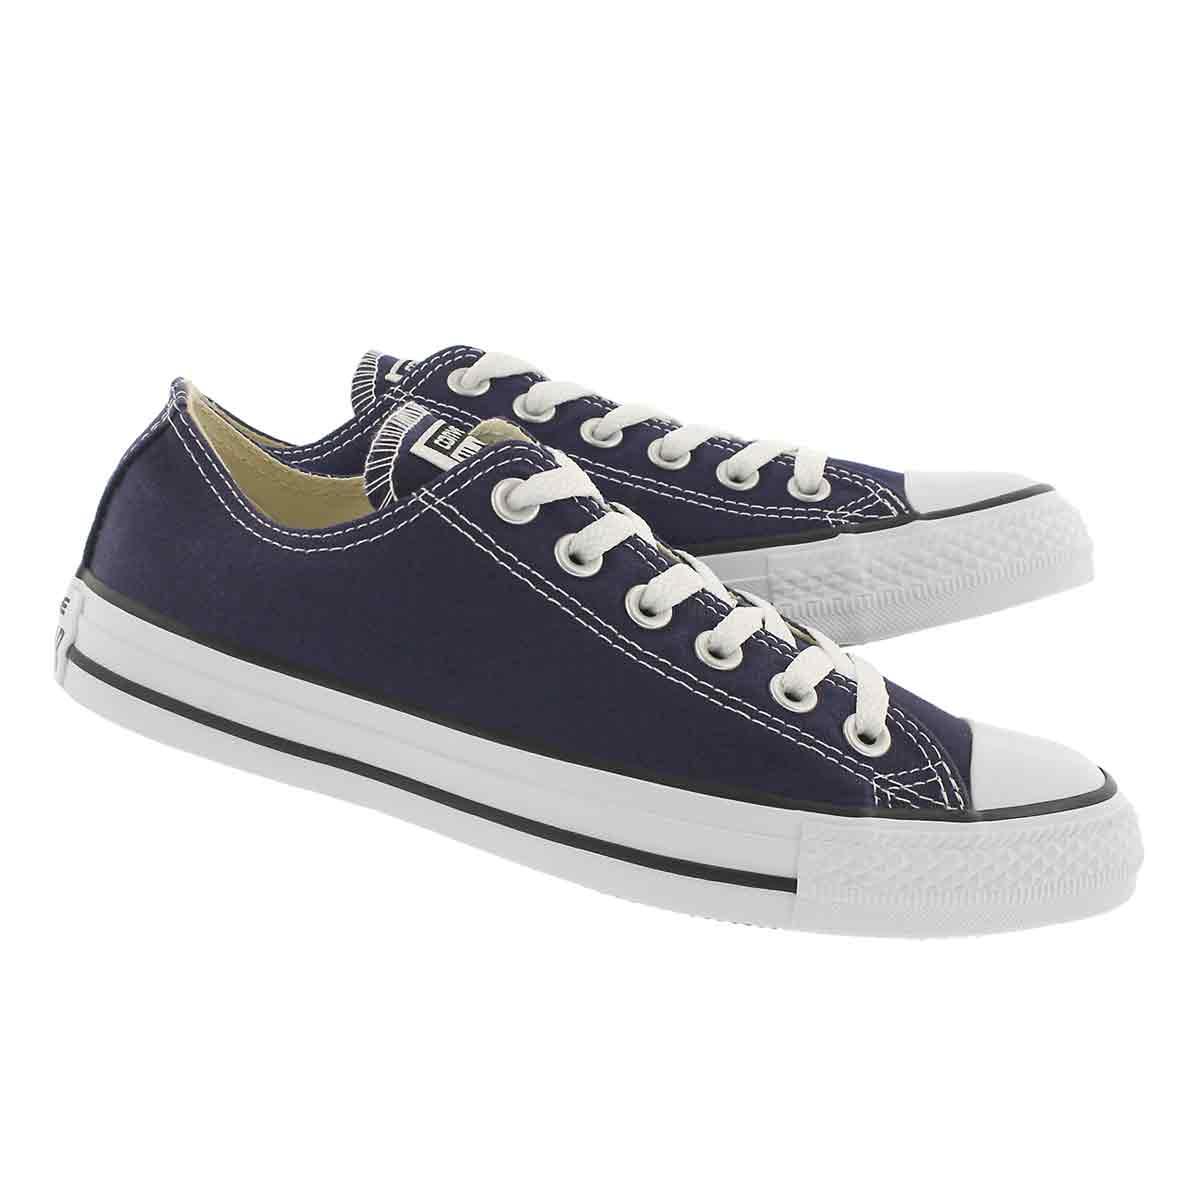 Lds CT A/S Seasonal mdnt indigo sneaker